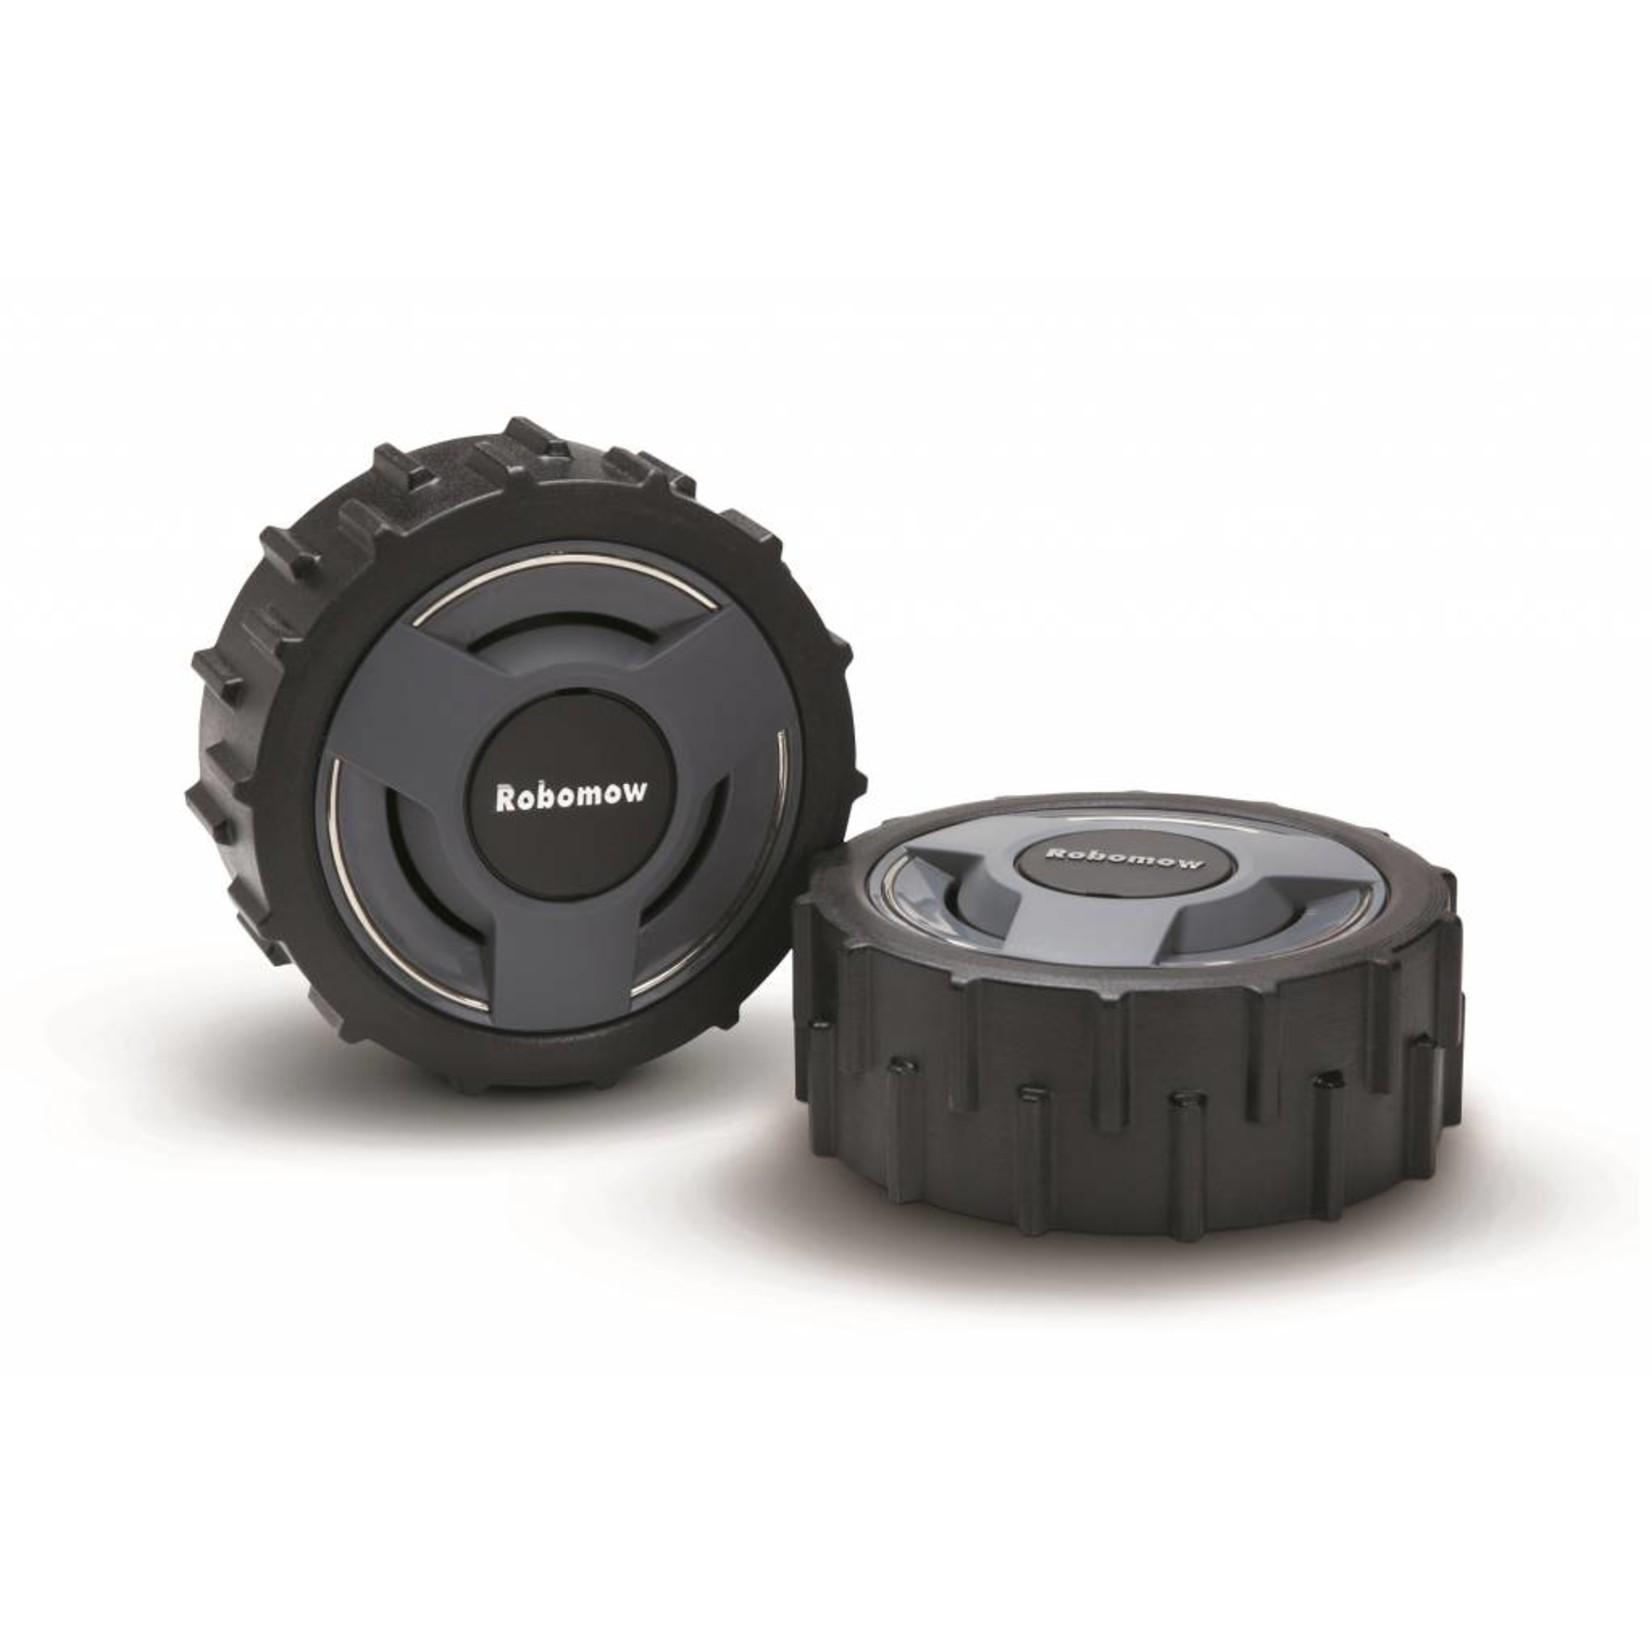 Robomow Robomow Power Wheels Räder (für MC/RC-Serie) MRK7012A